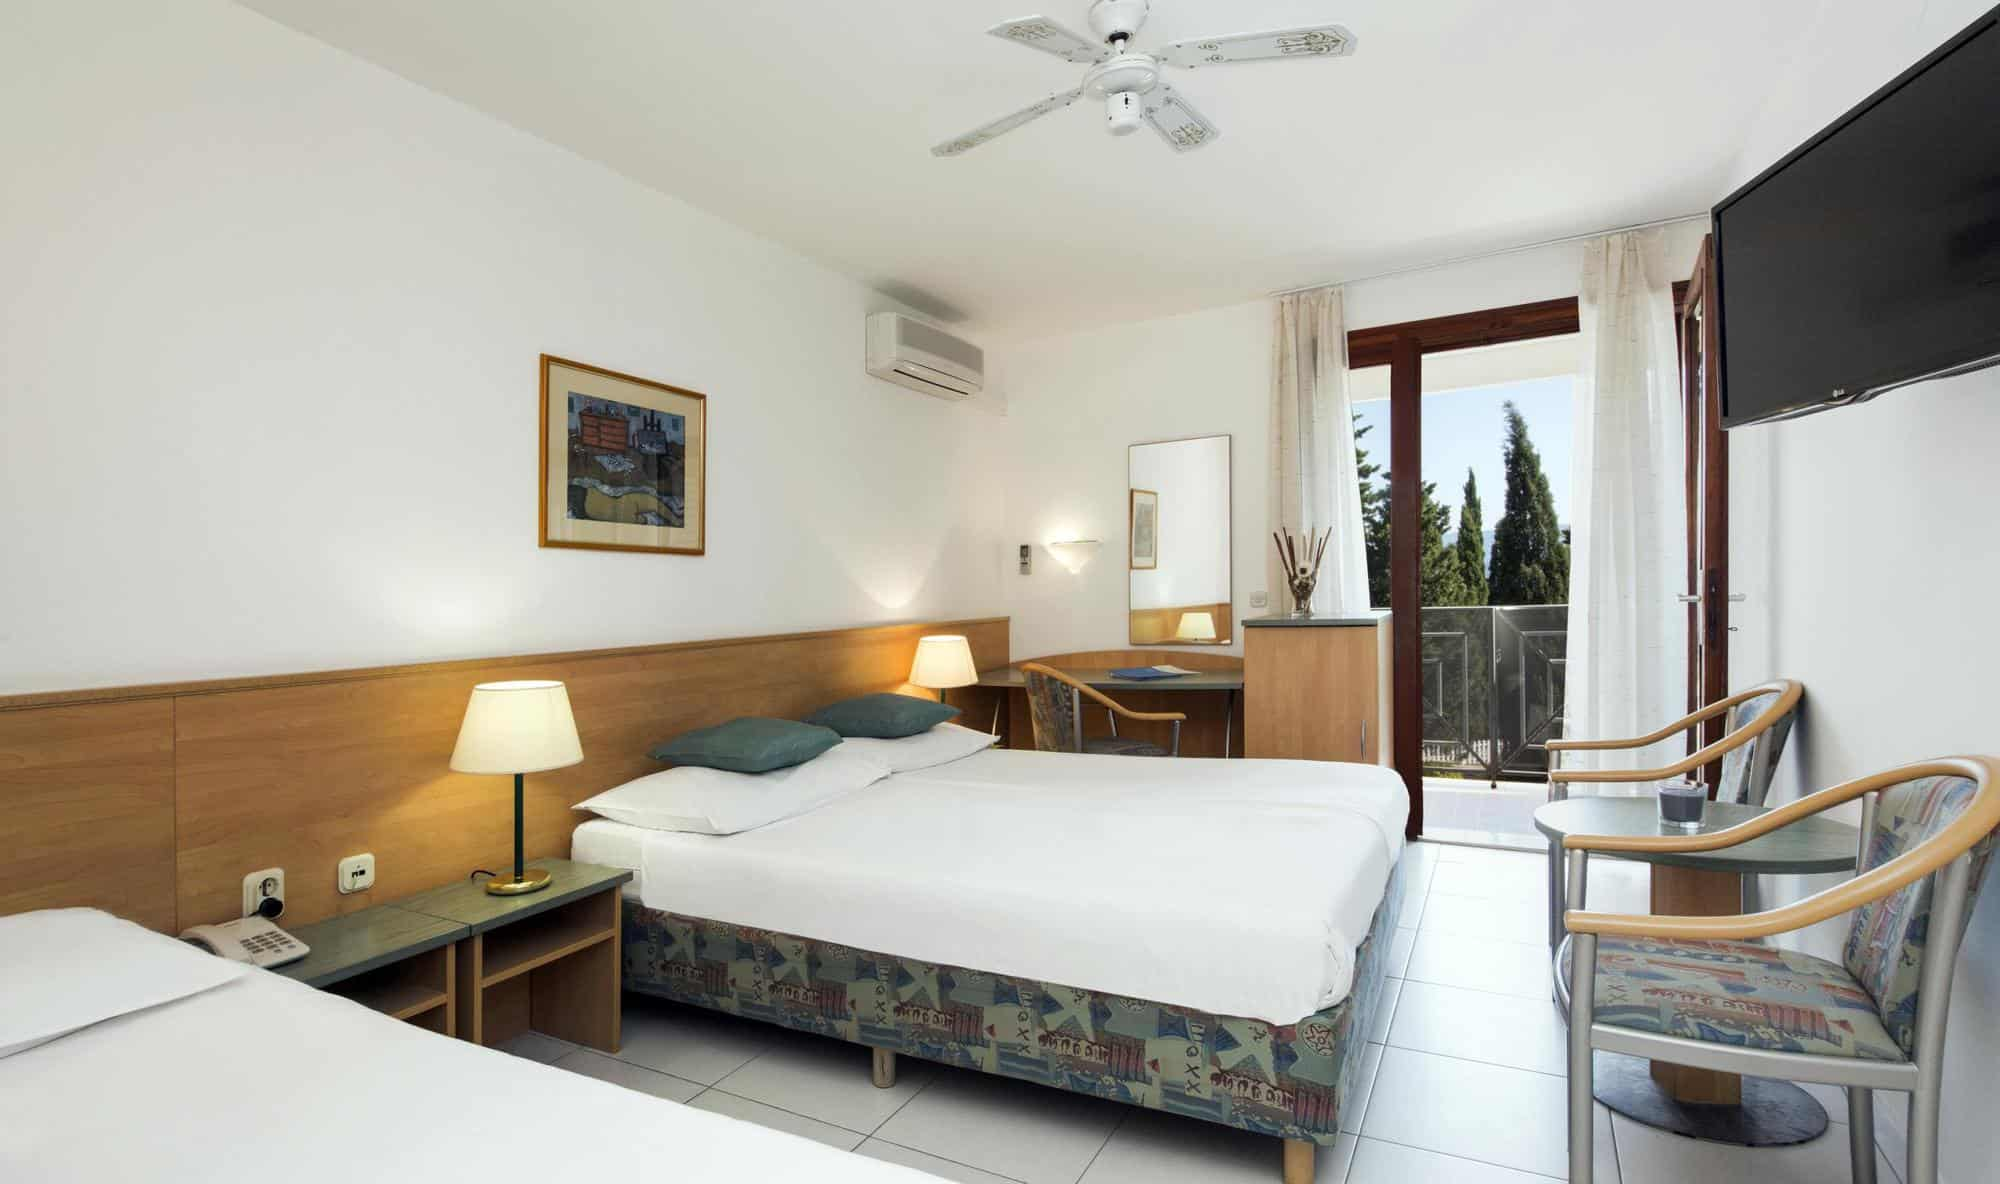 05 hotel bonaca superior double room 2